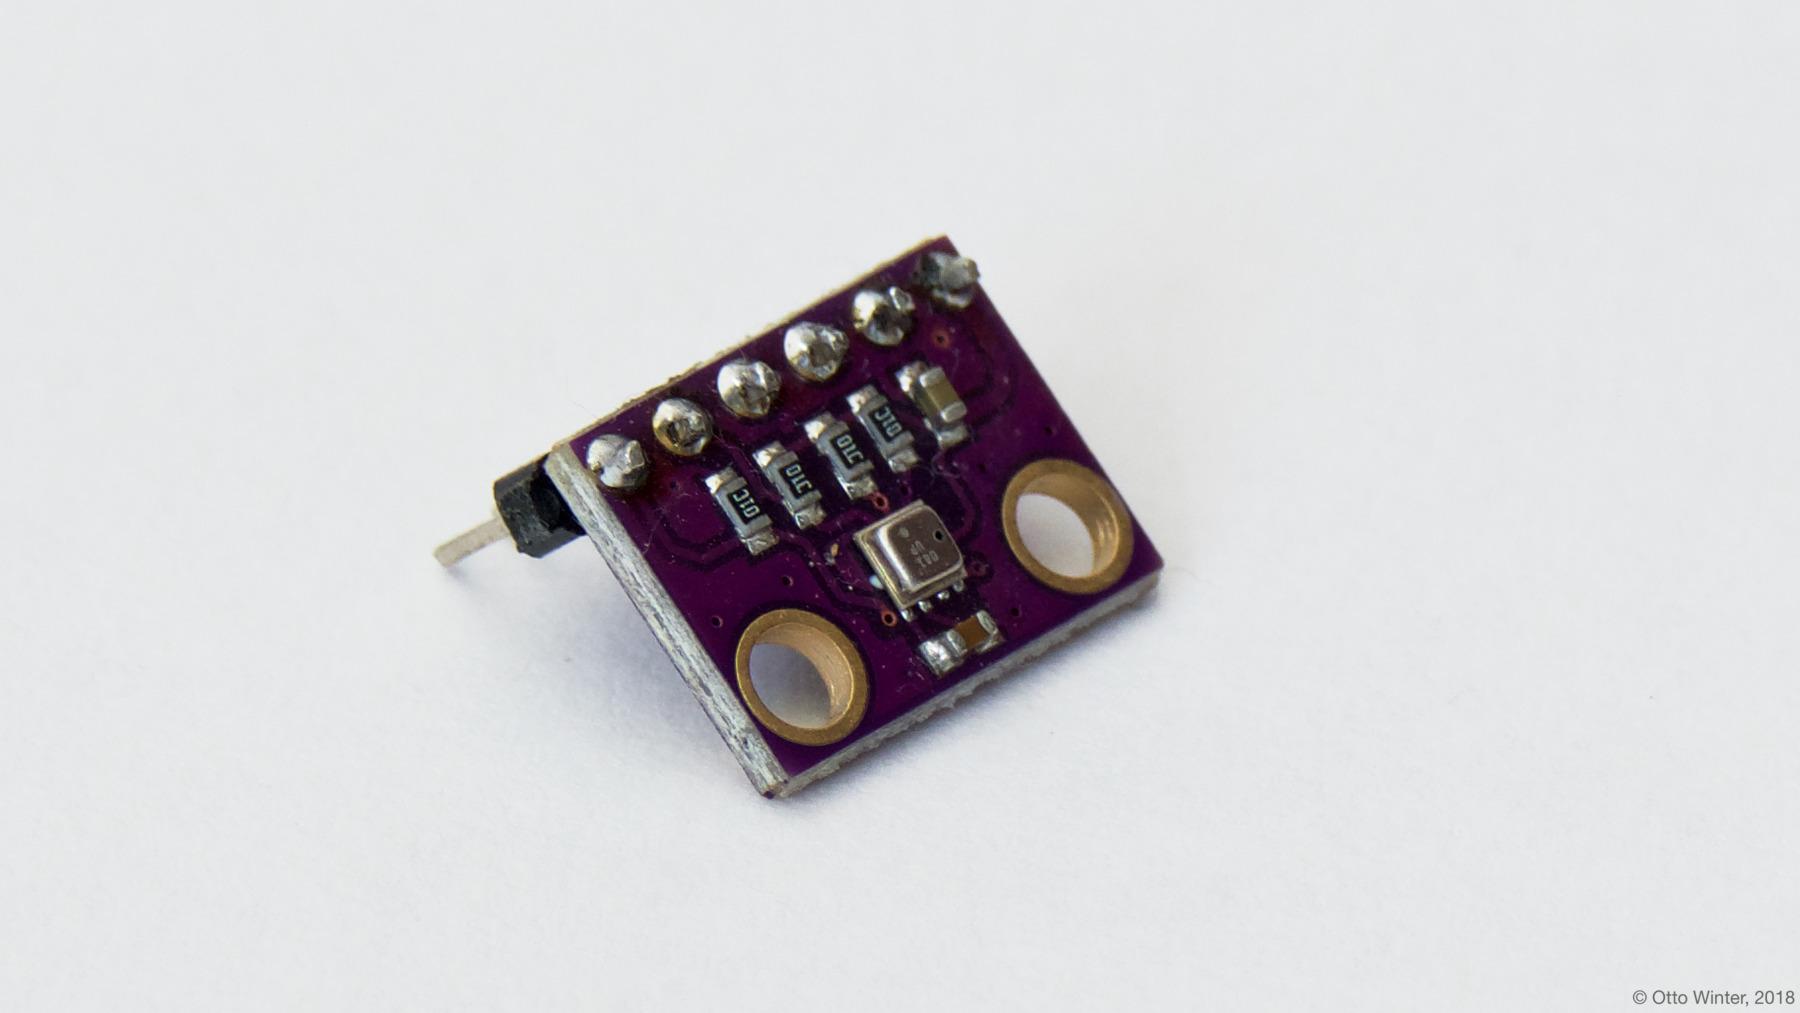 BME280 Temperature+Pressure+Humidity Sensor — ESPHome